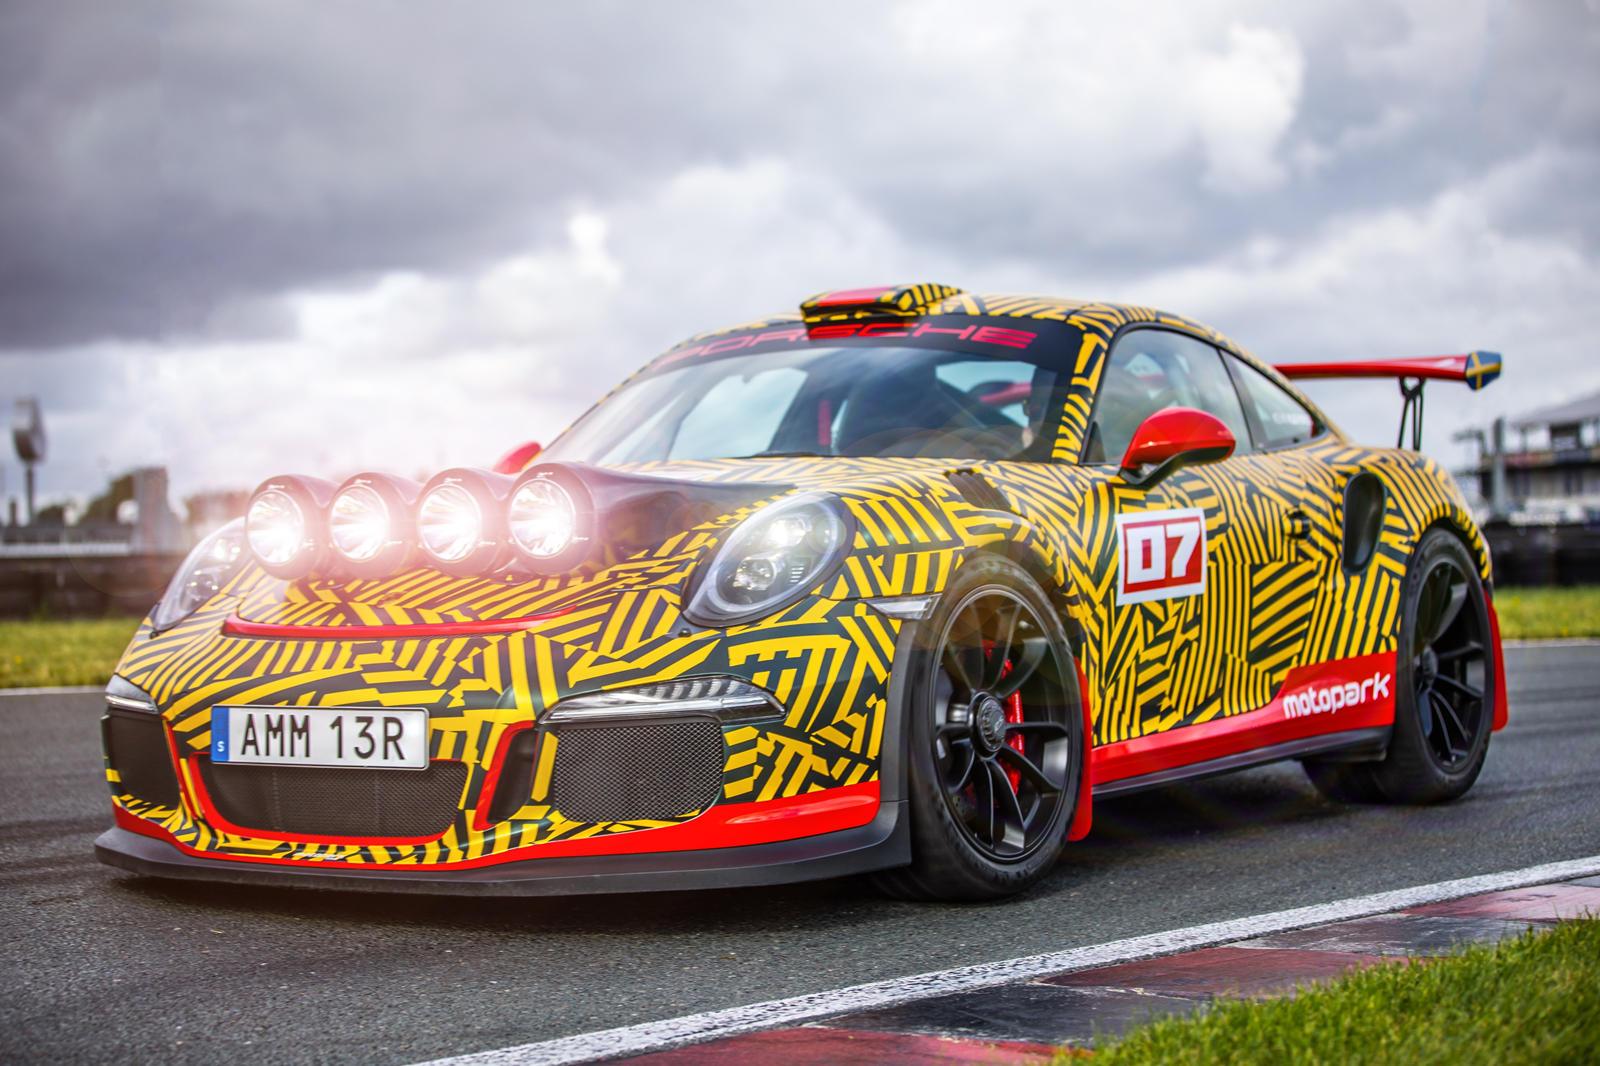 Porsche 911 GT3 RS Transformed Into Road-Legal Rally Car